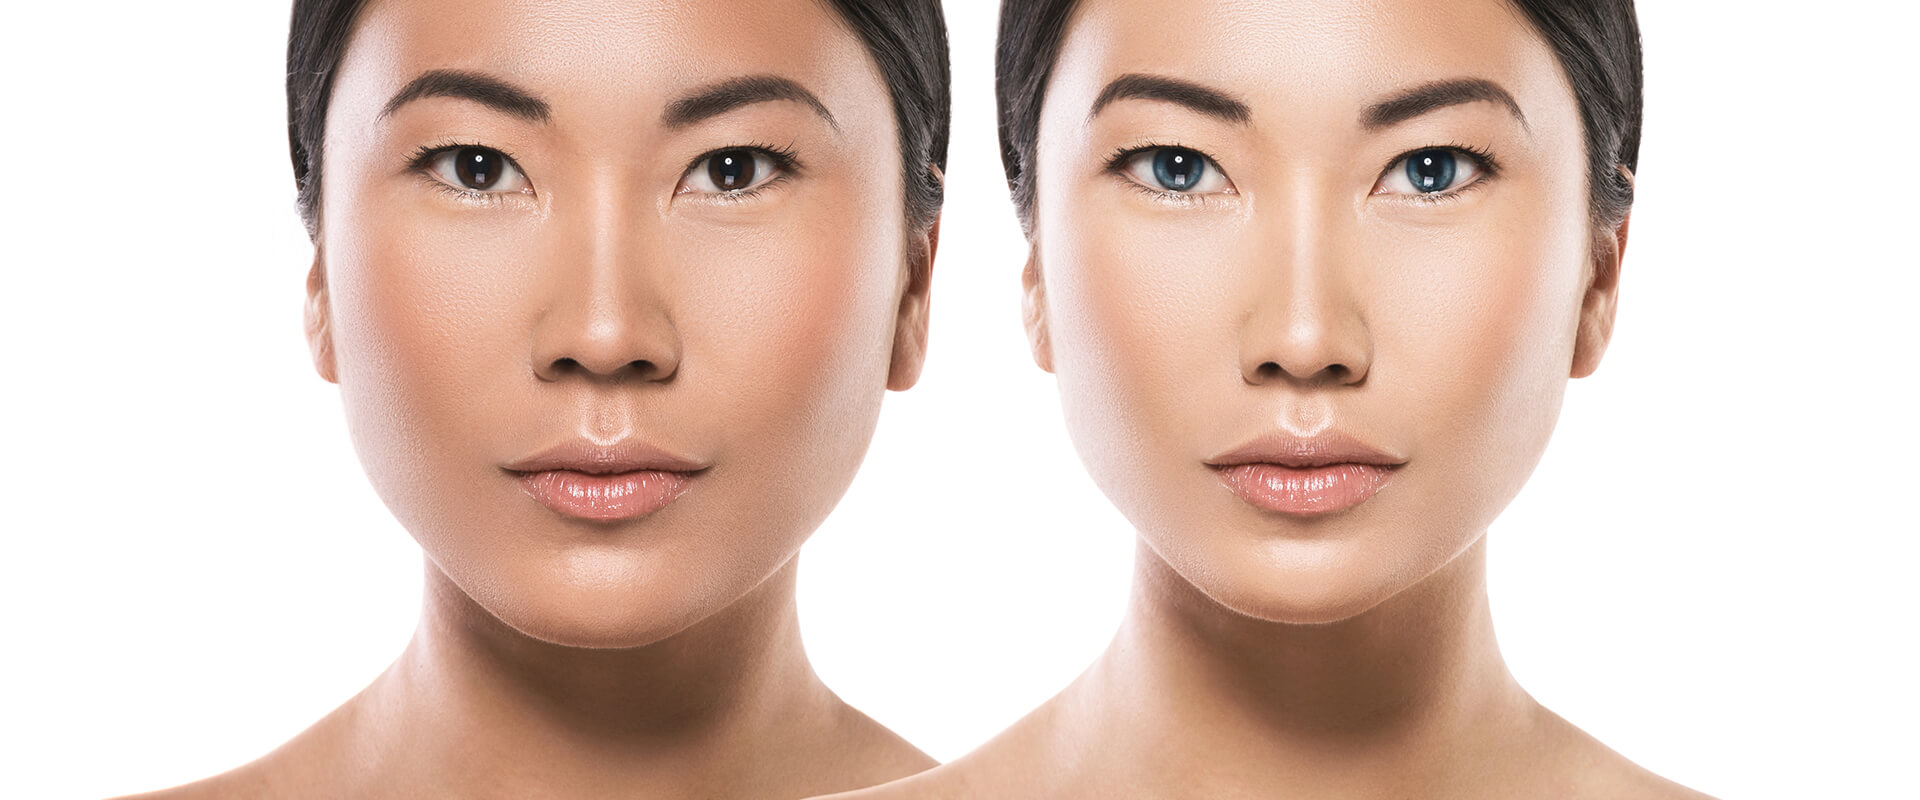 53 Most Popular Plastic Surgery Procedures In Korea - Seoul